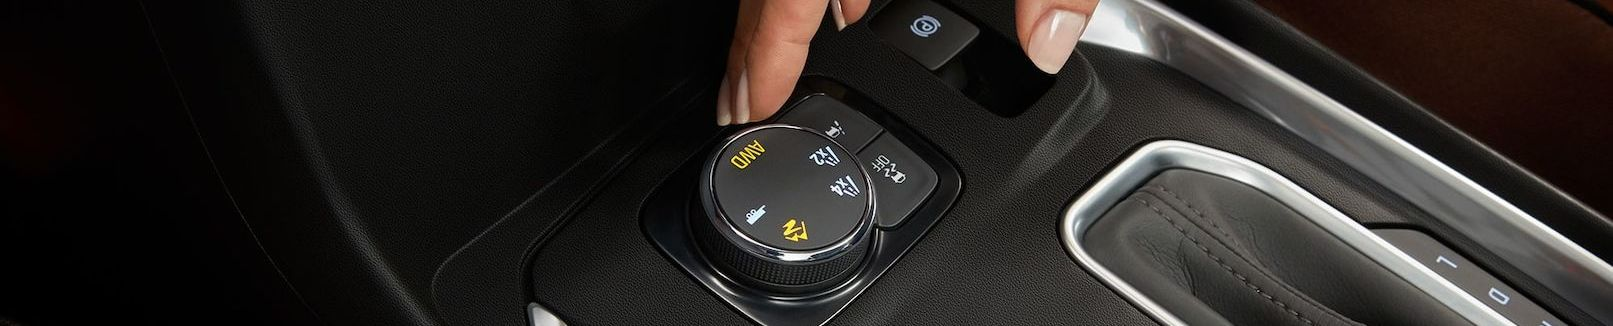 2019 Traverse Drive Mode